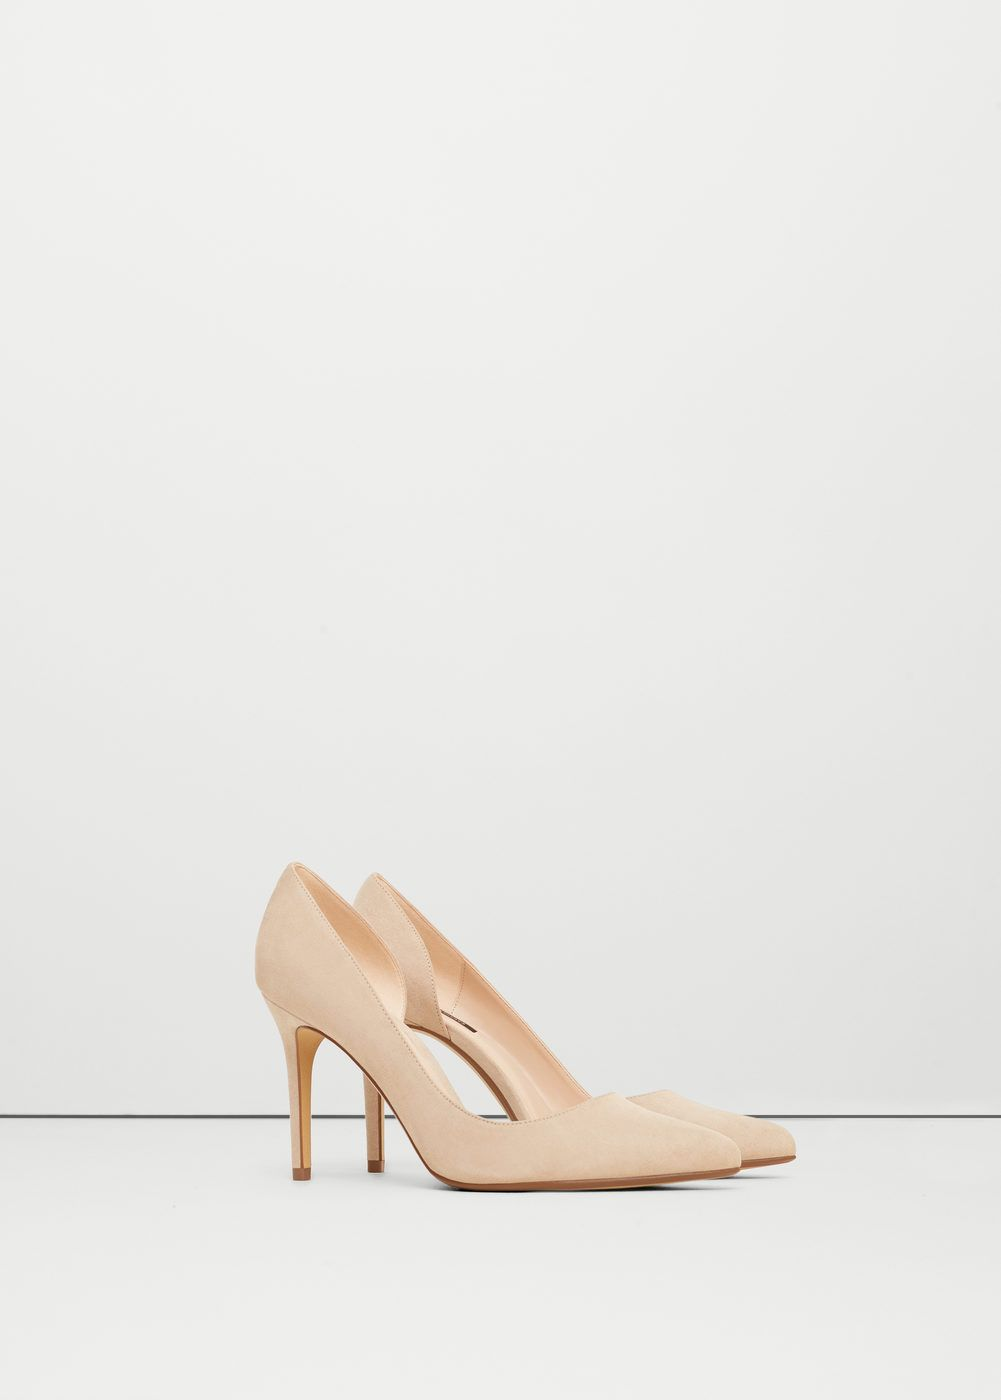 Stiletto shoes - Shoes for Woman | MANGO Nigeria